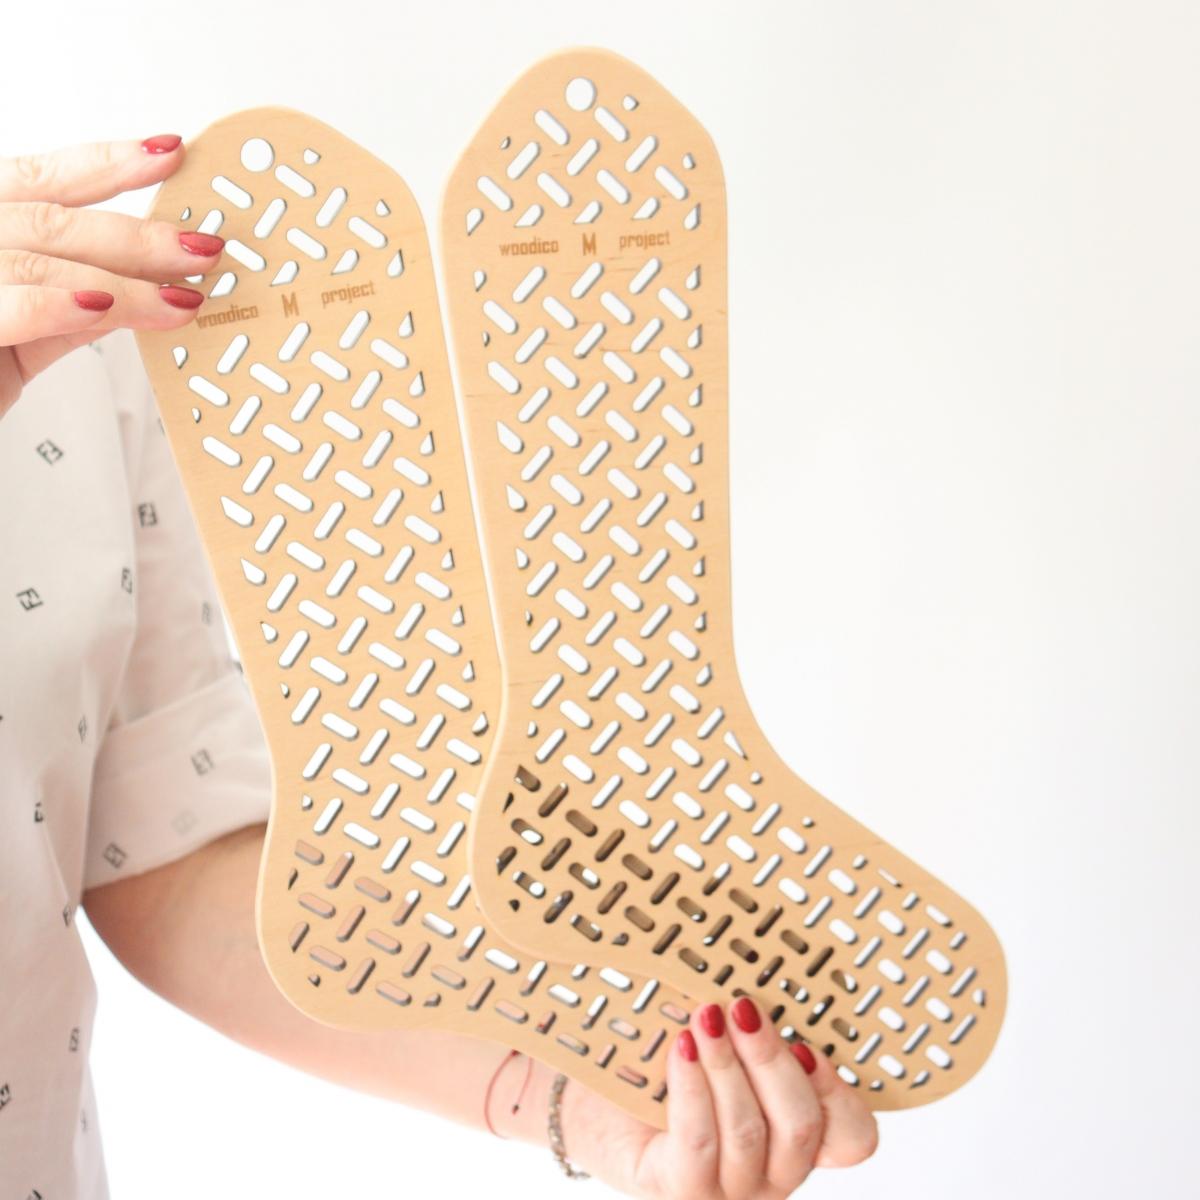 woodico.pro wooden sock blockers stitches 8 1200x1200 - Wooden sock blockers / Stitches